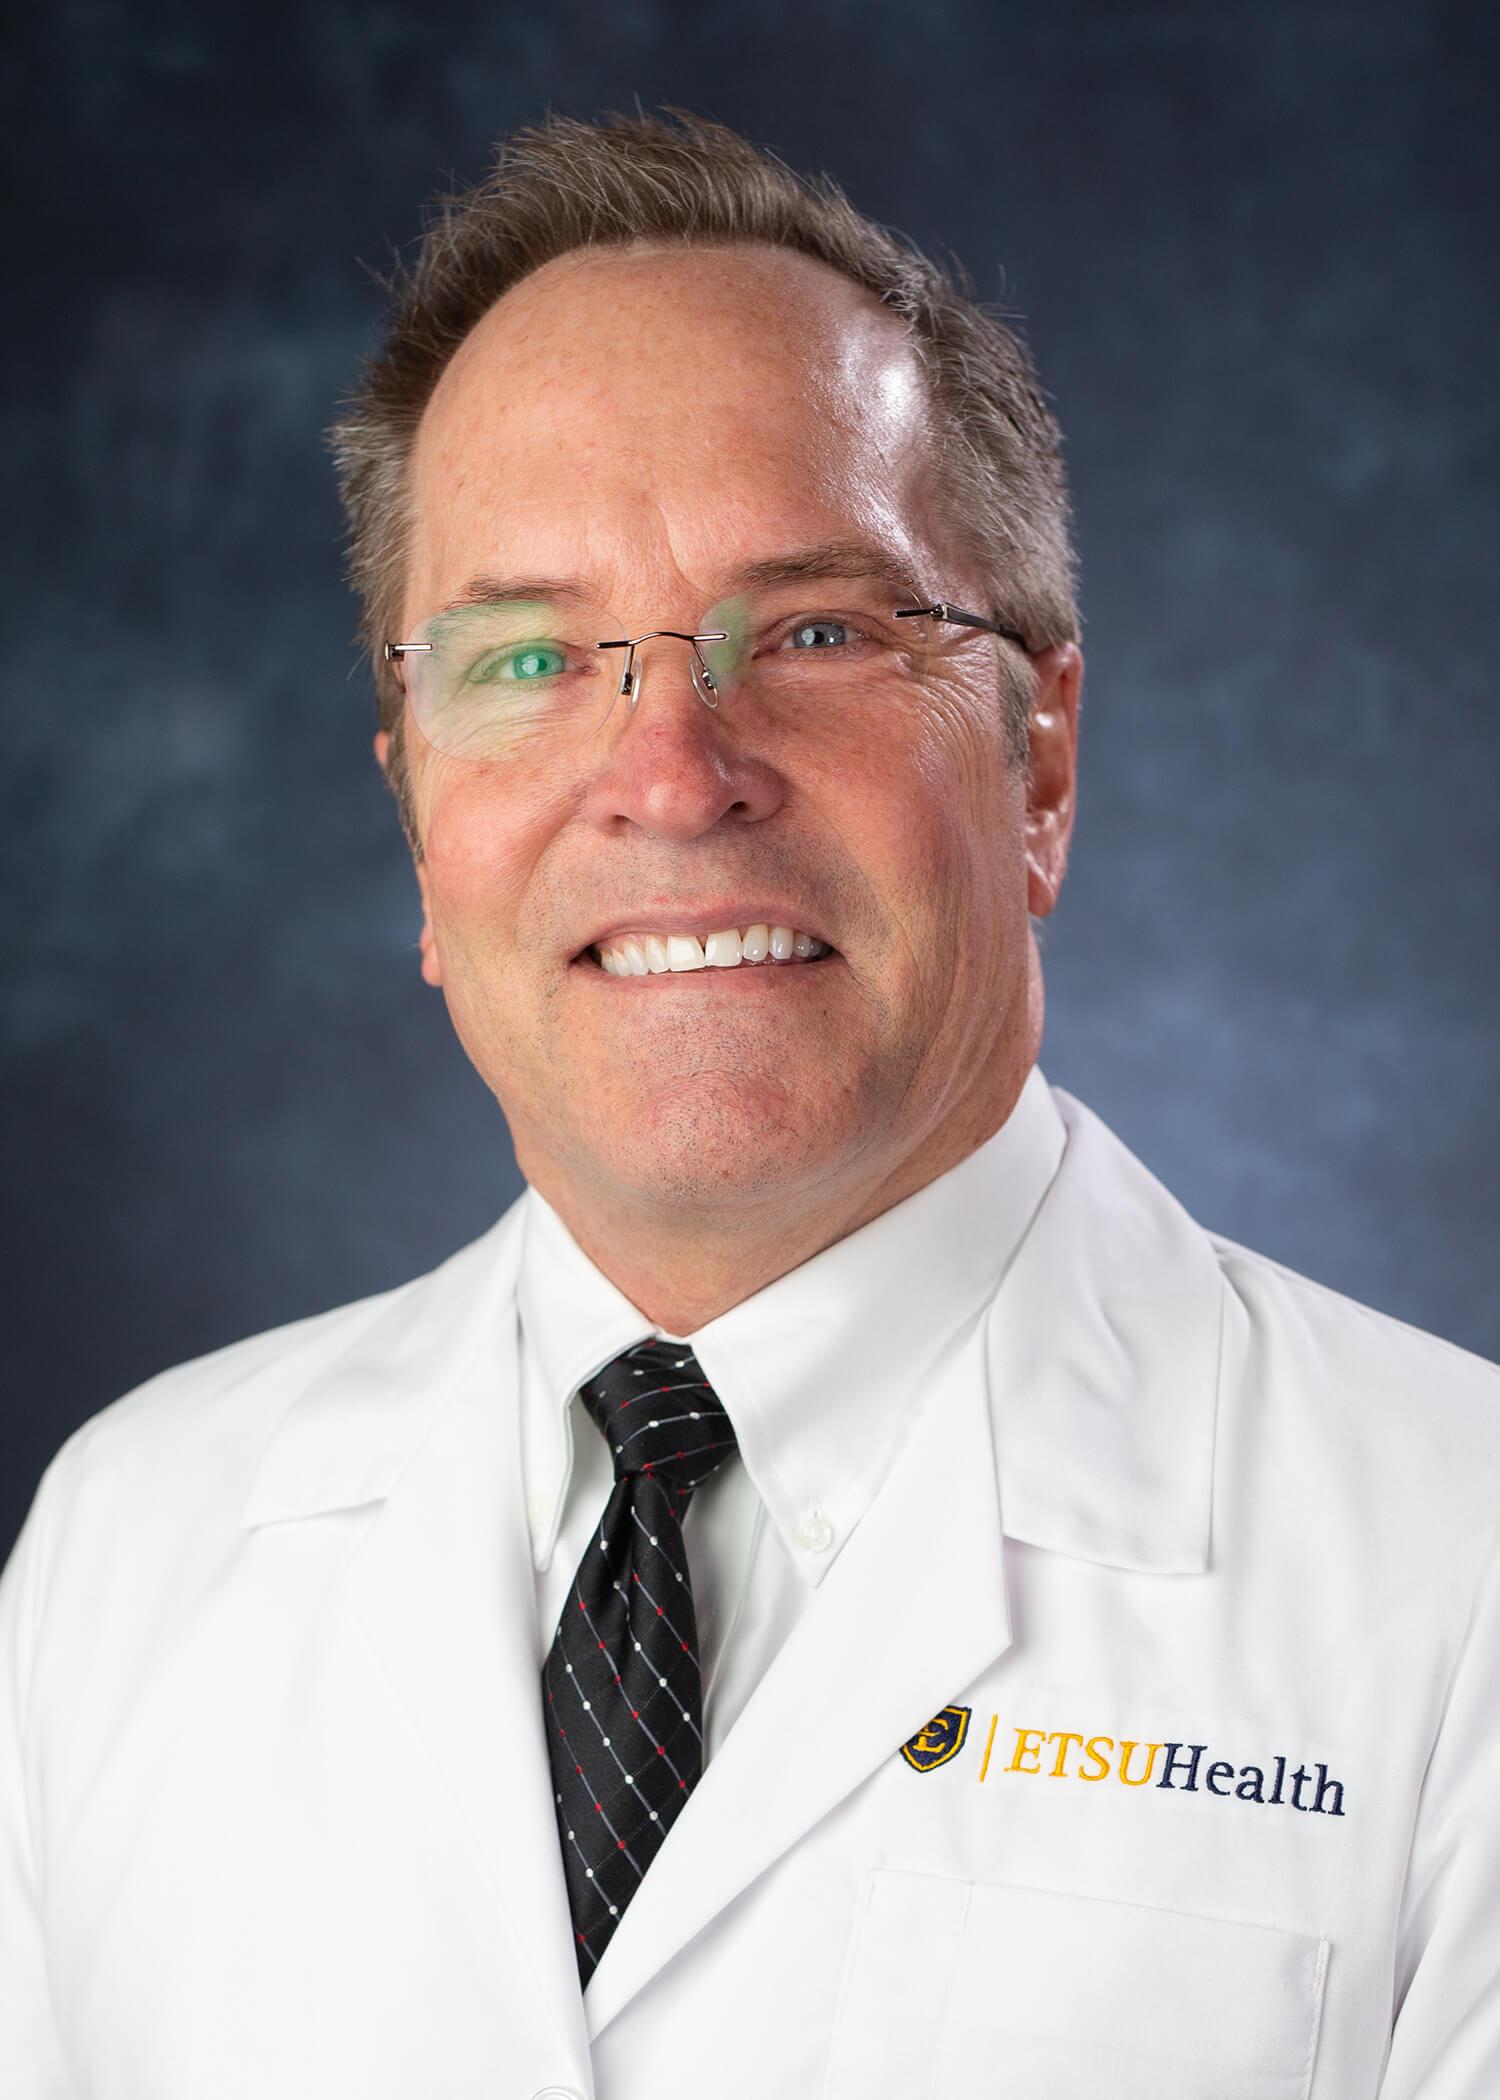 Photo of Brian Ingalls, M.D.